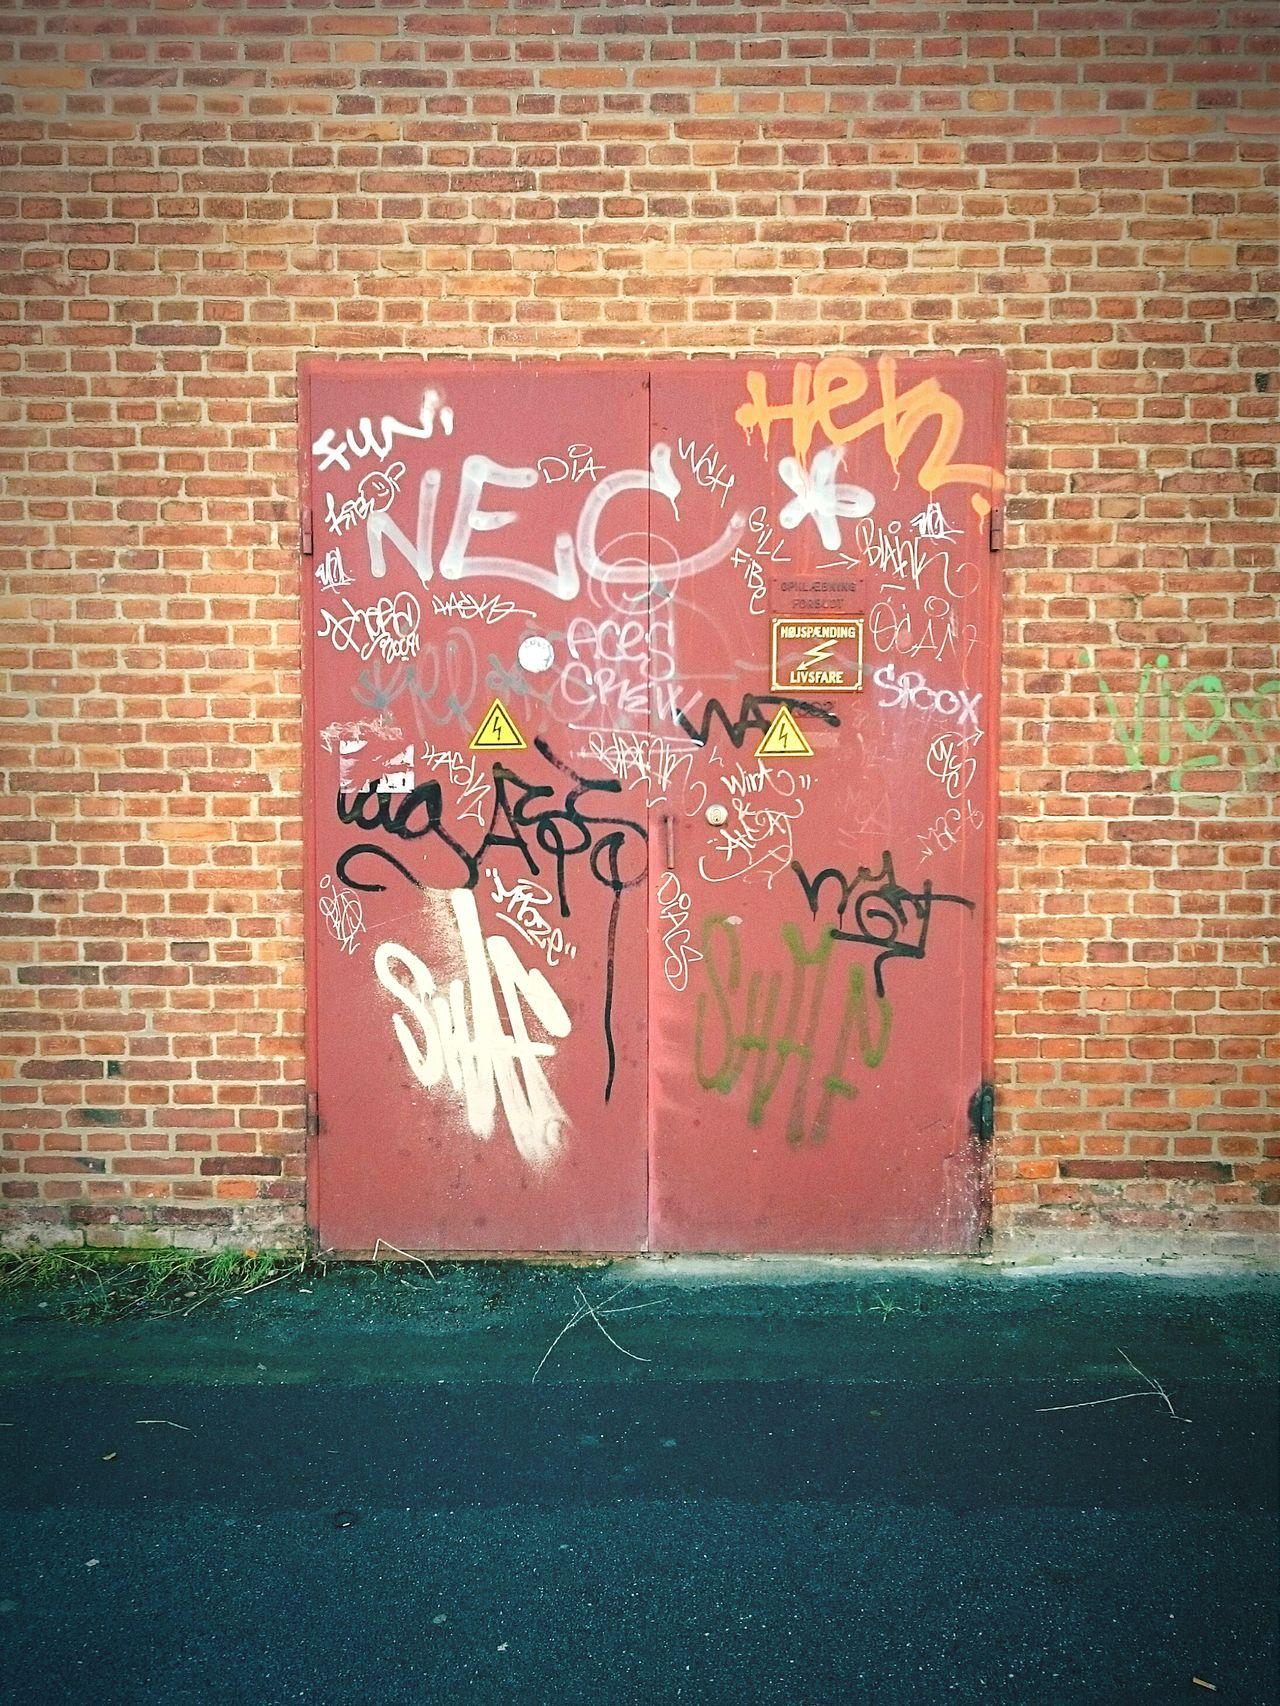 Door Graffiti Urbanphotography Urban Landscape Tags Aerosol Spraypaint Bricks Wall Copenhagen